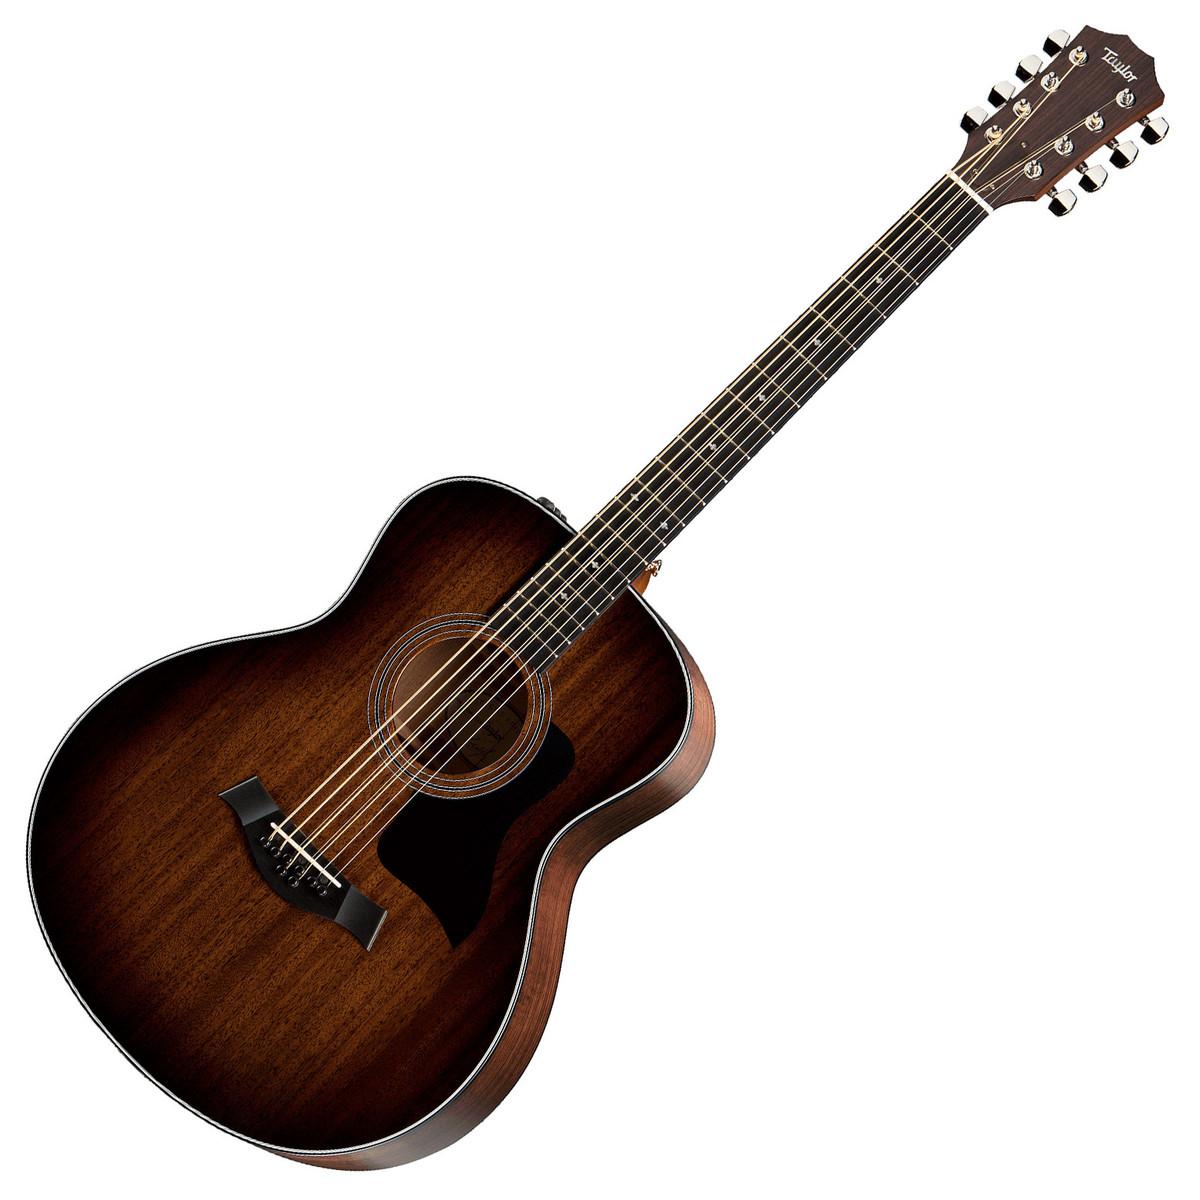 taylor 326e baritone 8 ltd electro acoustic guitar at. Black Bedroom Furniture Sets. Home Design Ideas